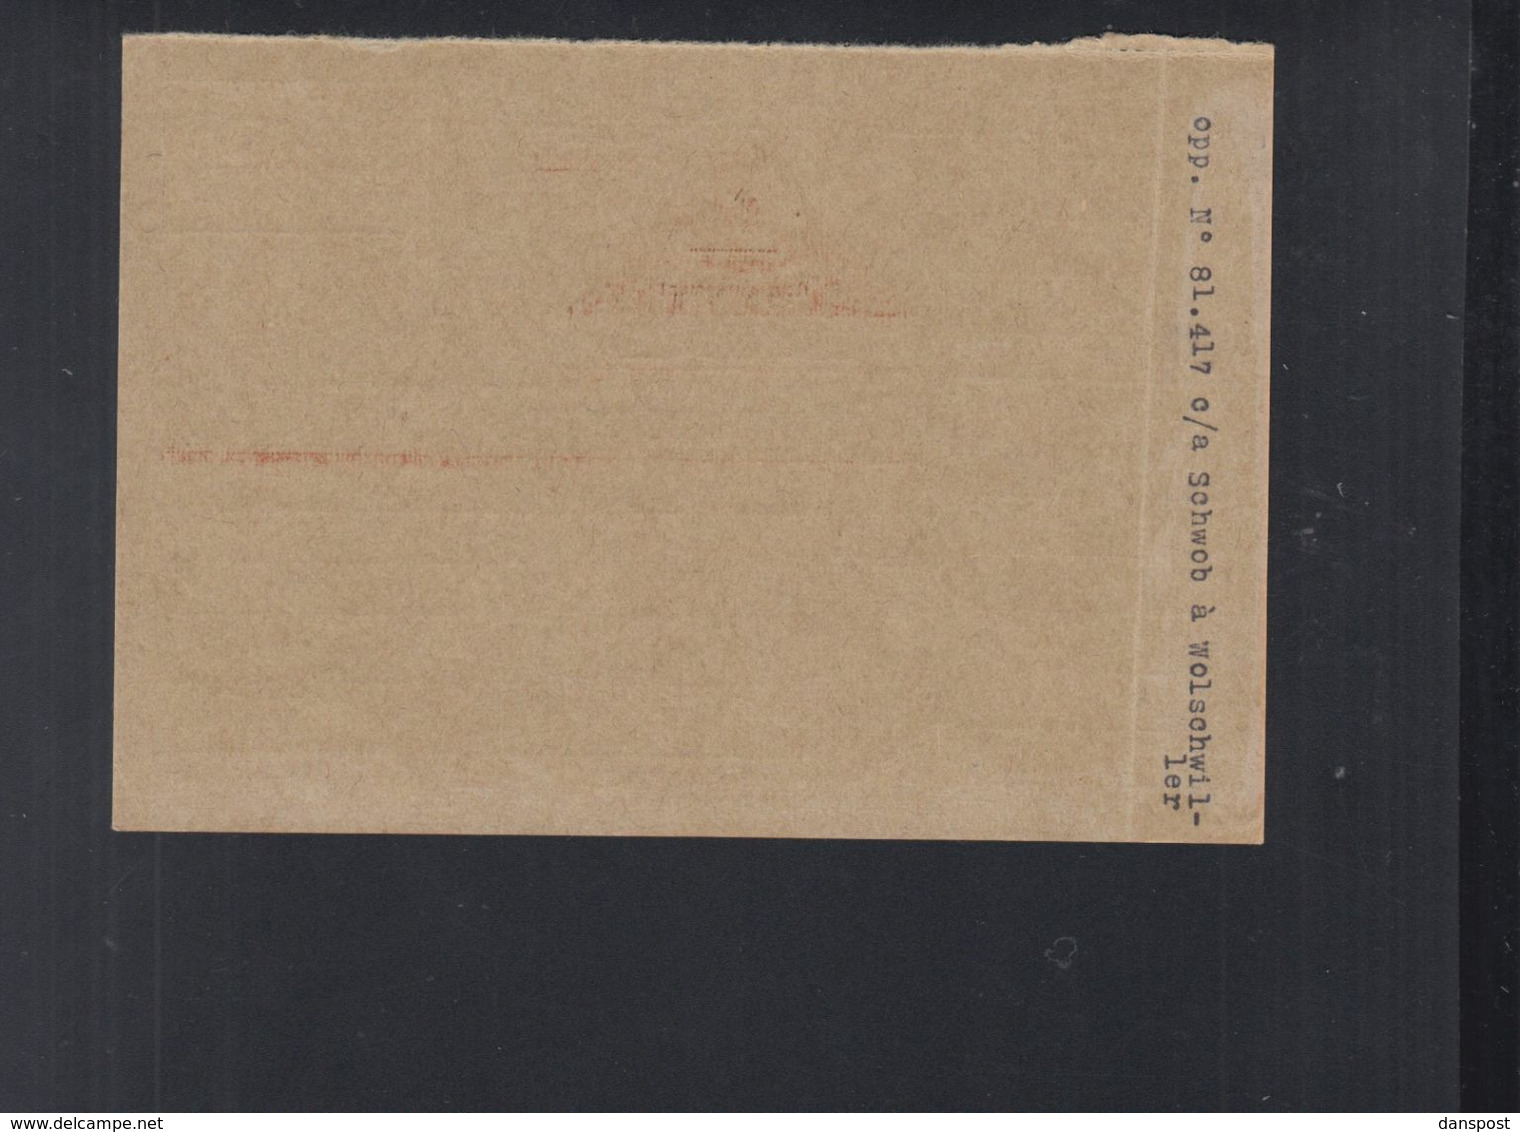 Frankreich France PK Remboursement 1936 Ferrette - Poststempel (Briefe)